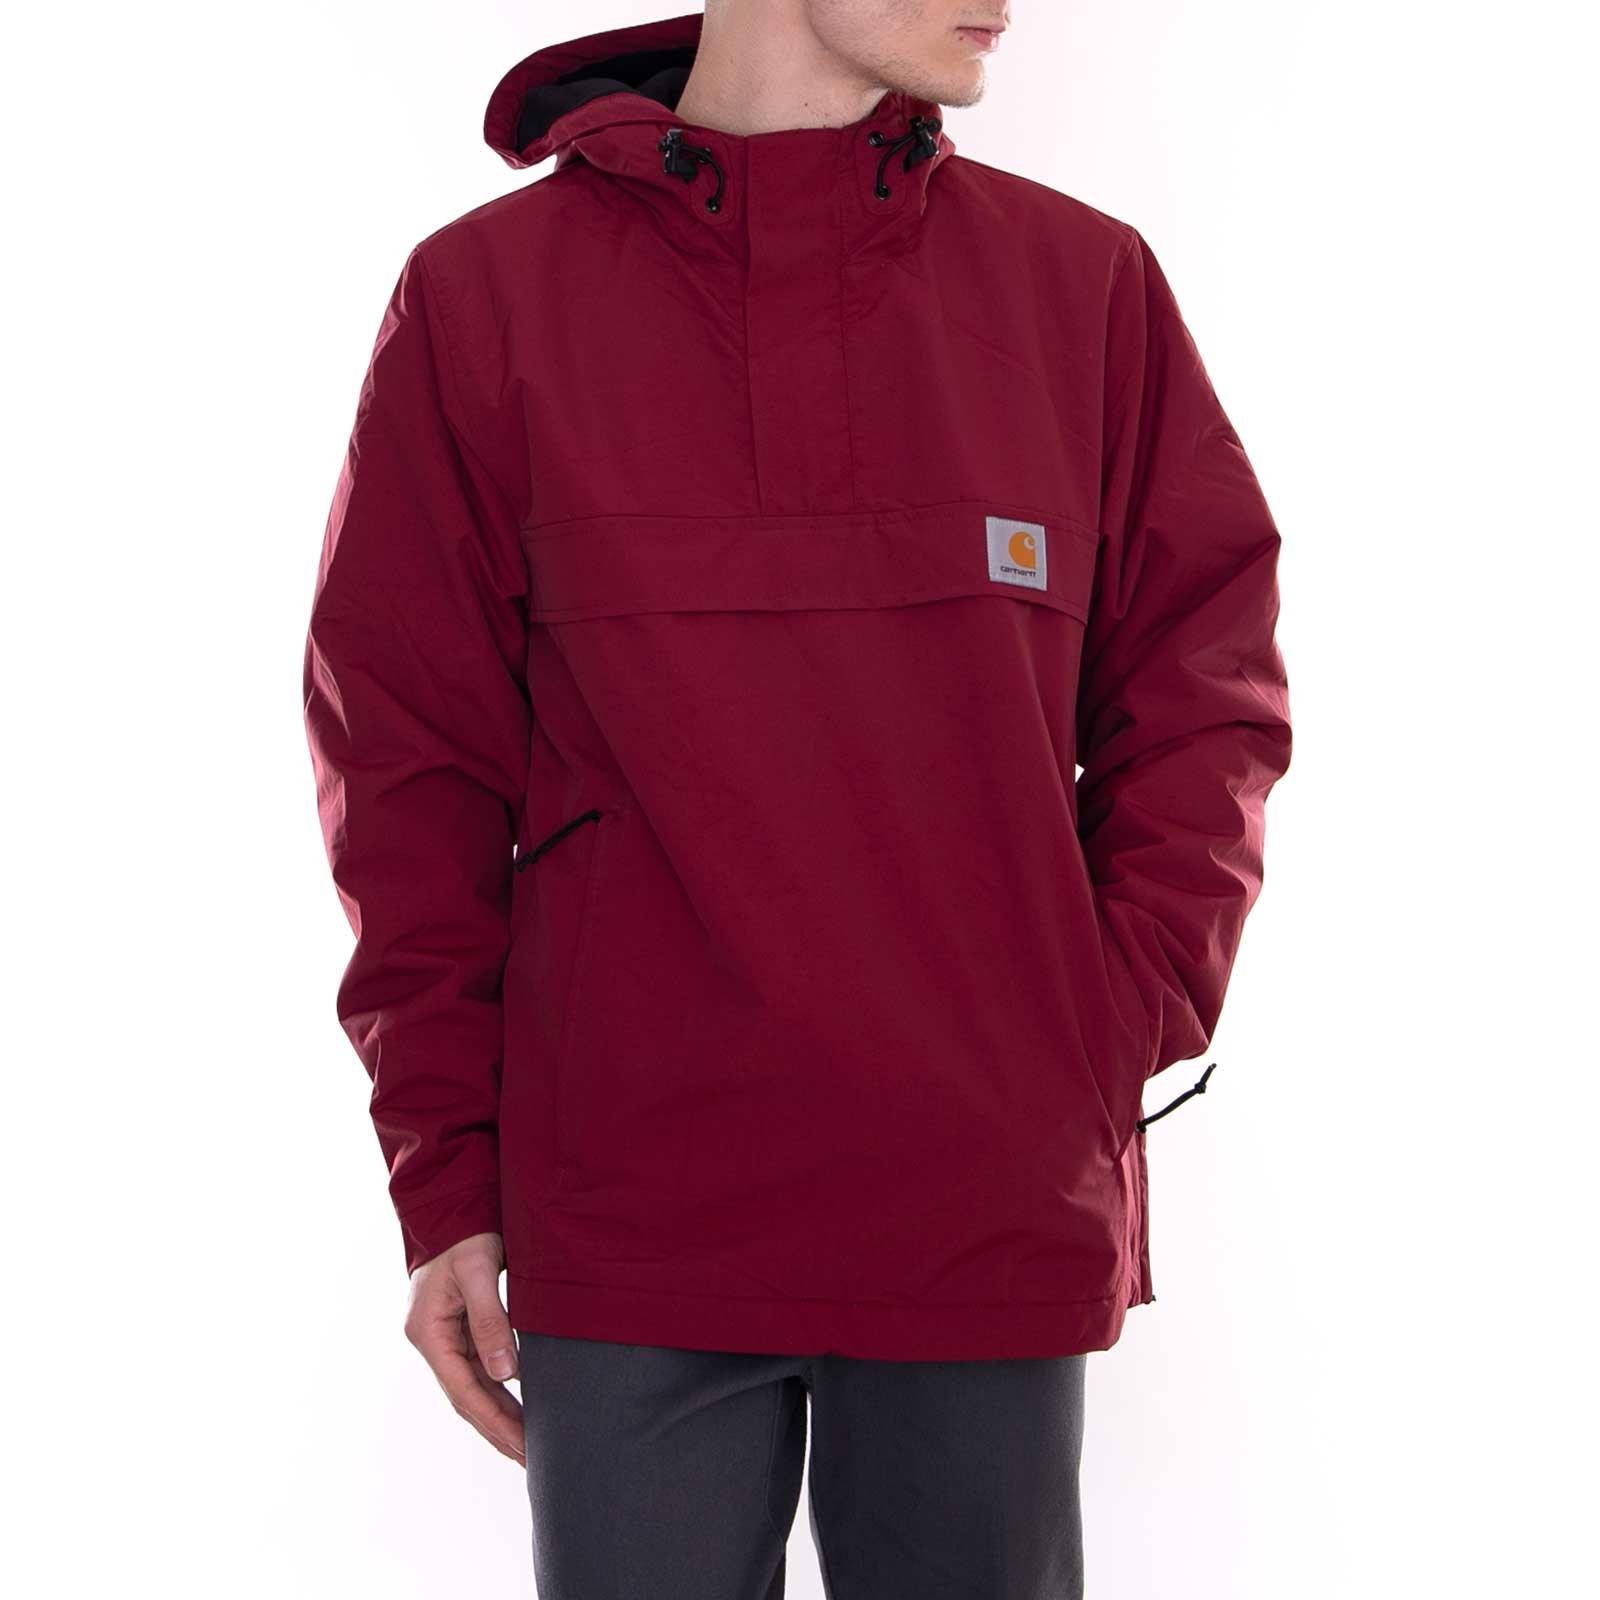 c8ce985893 Carhartt Jackets Nimbus Pullover Mulberry Purple | eBay